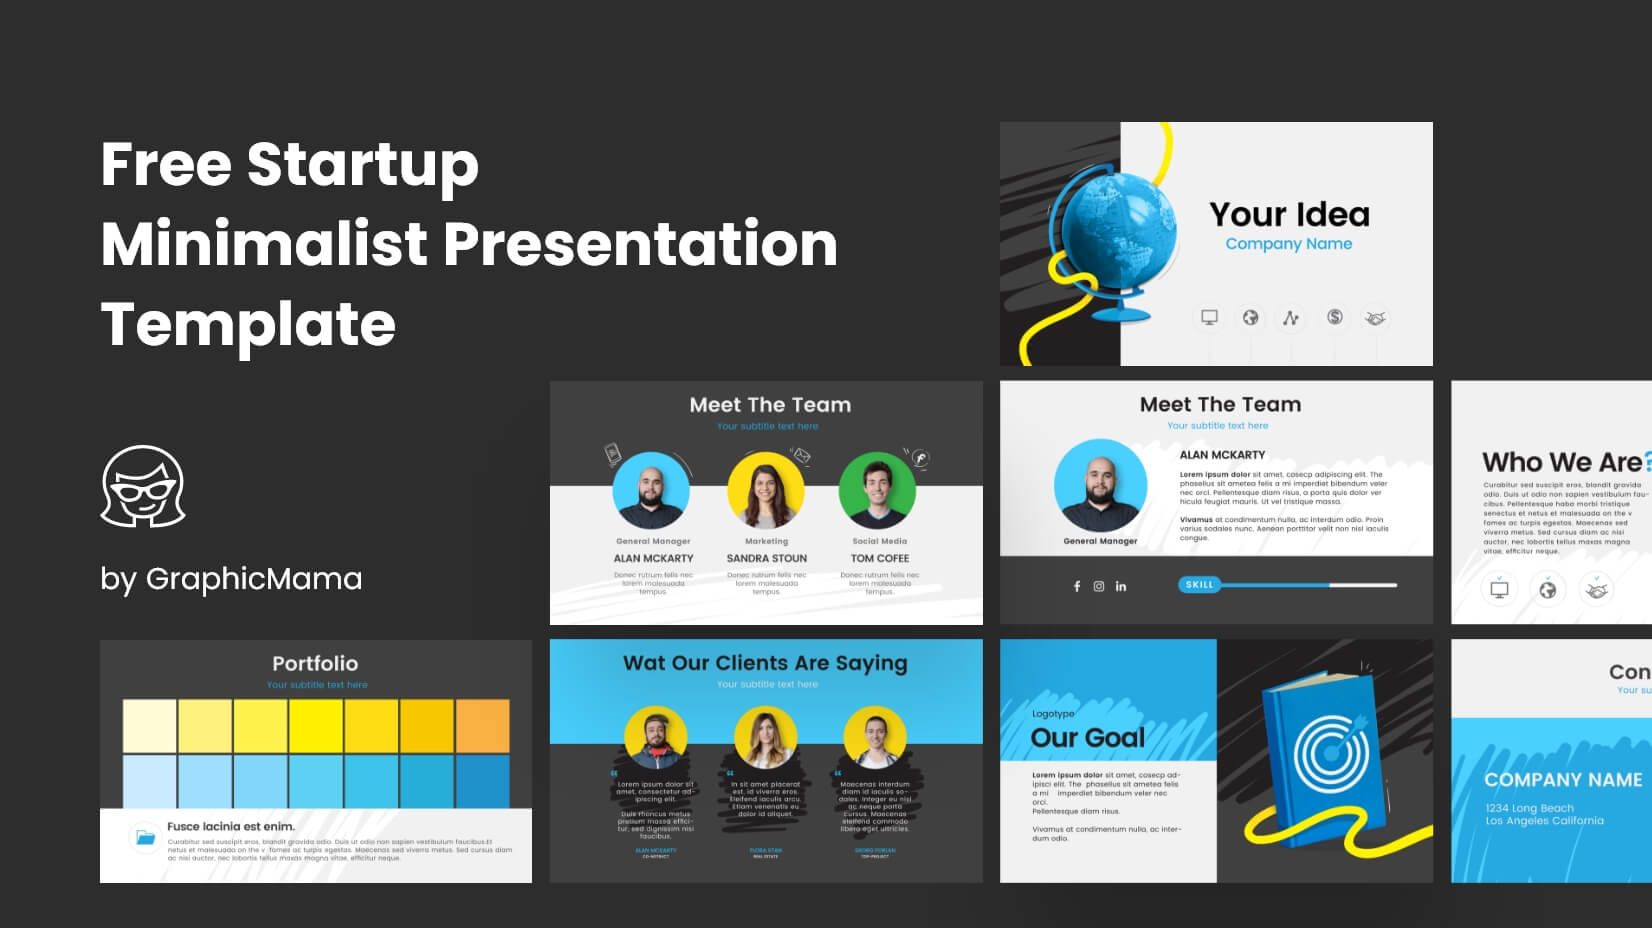 Free-Startup-Minimalist-Presentation-Template.